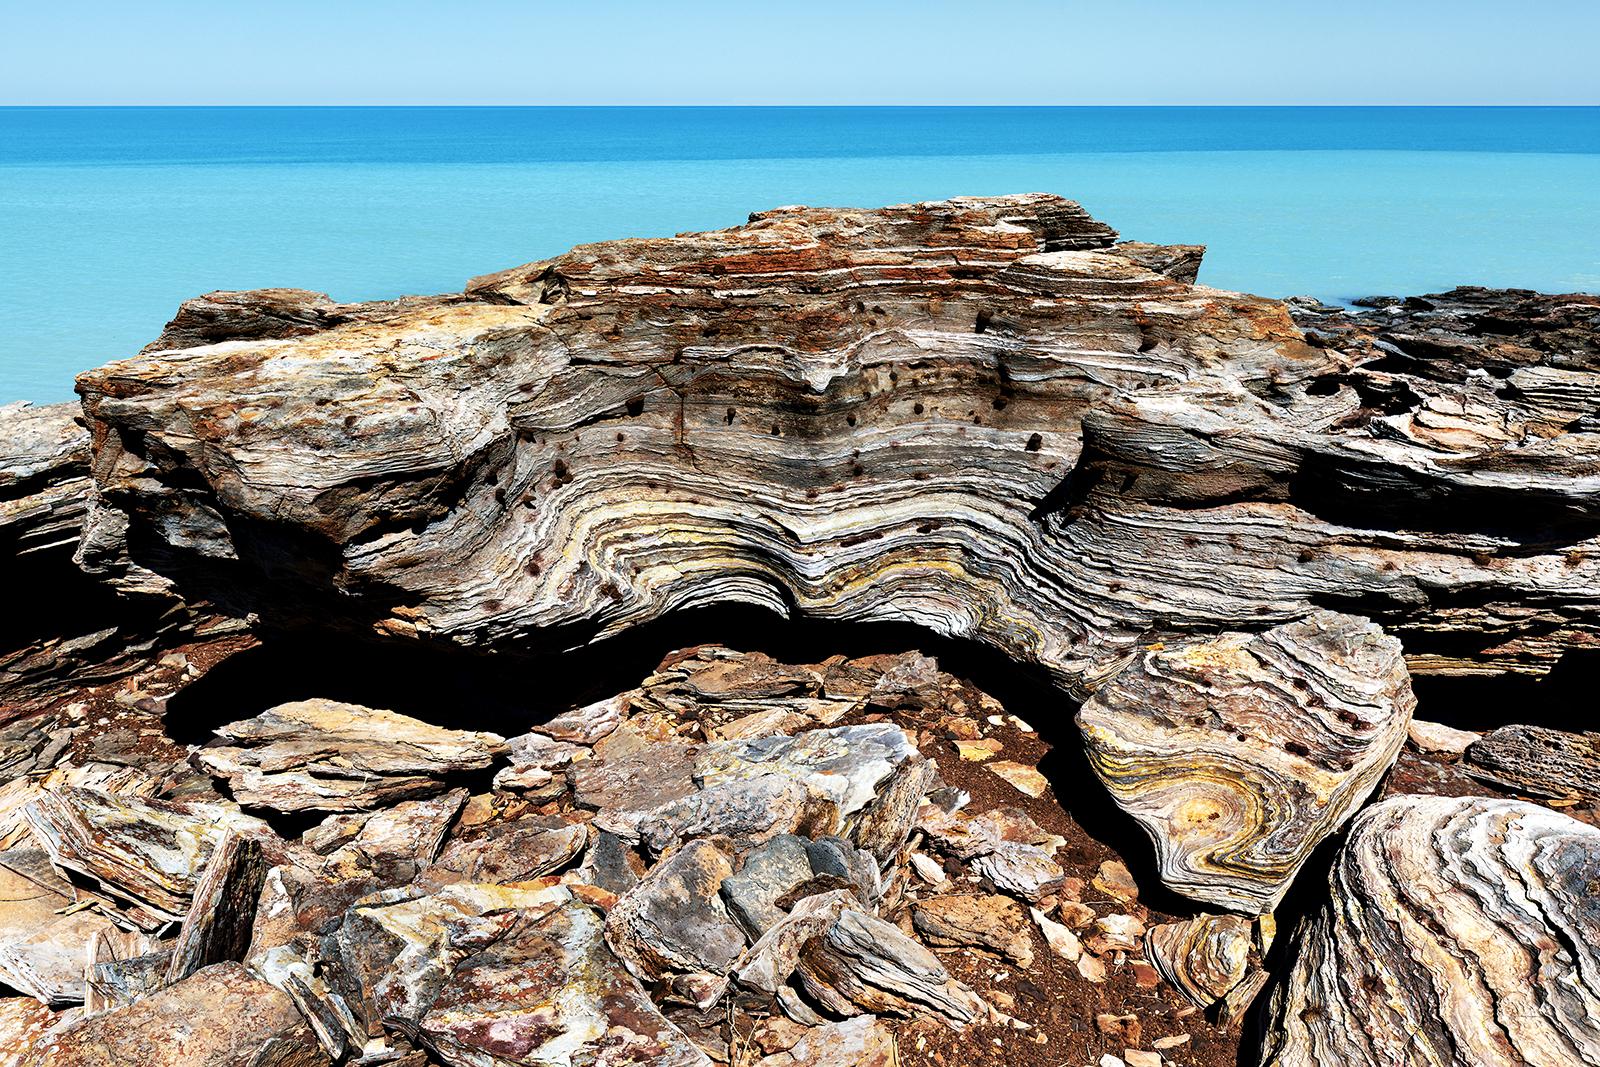 Reddell Beach #2, Broome WA